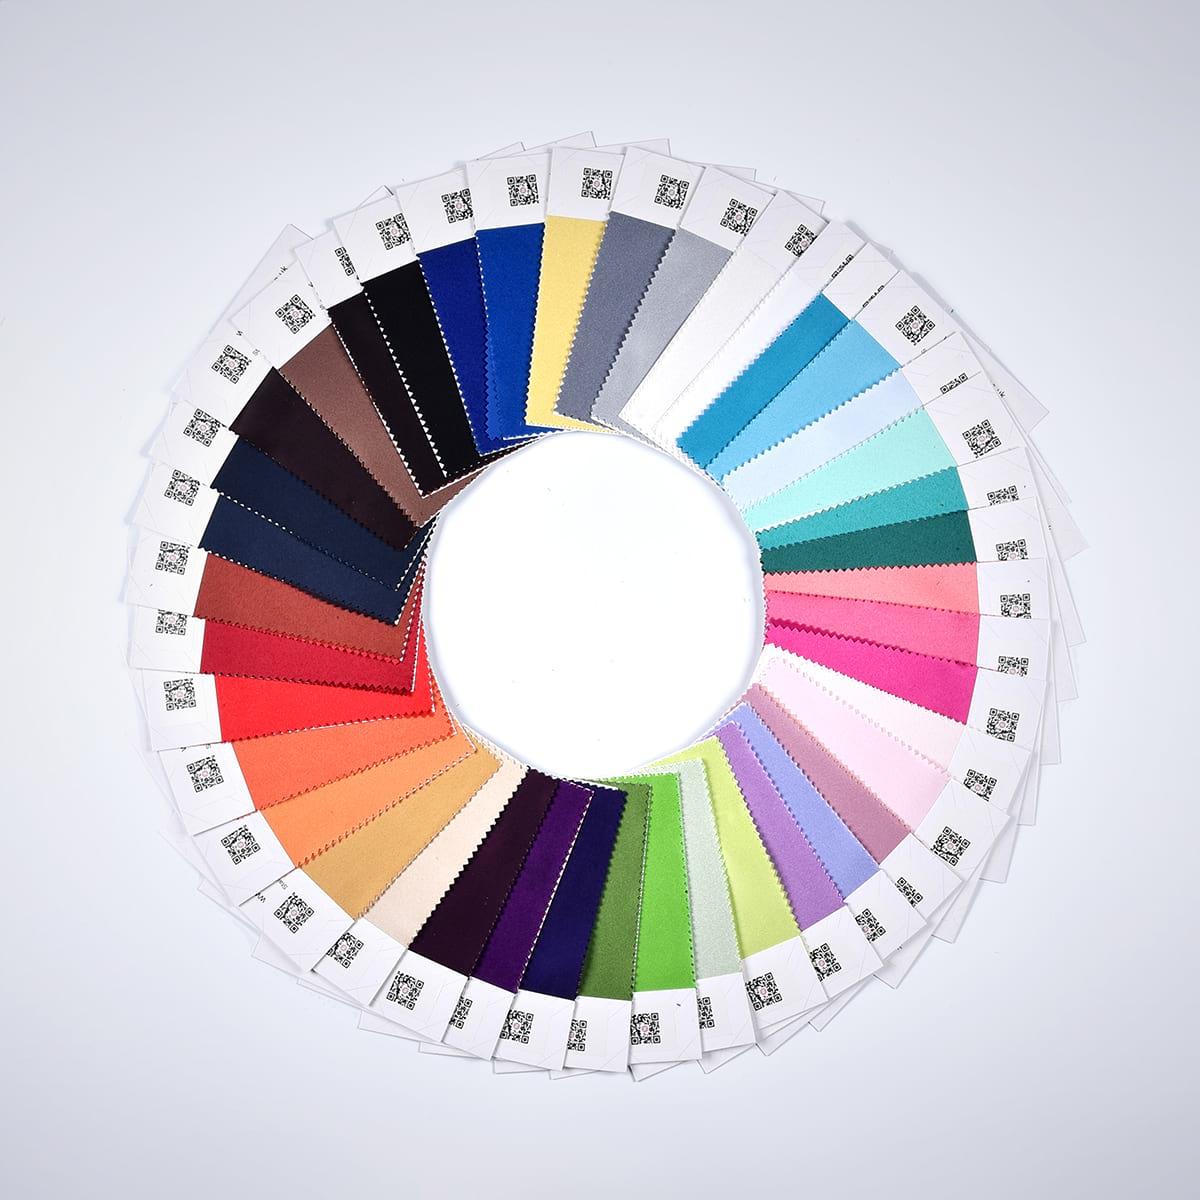 4 Kinds Of Fabrics (Satin/ Chiffon/ Taffeta/ Charmeuse) In One Piece 130Mm*180Mm